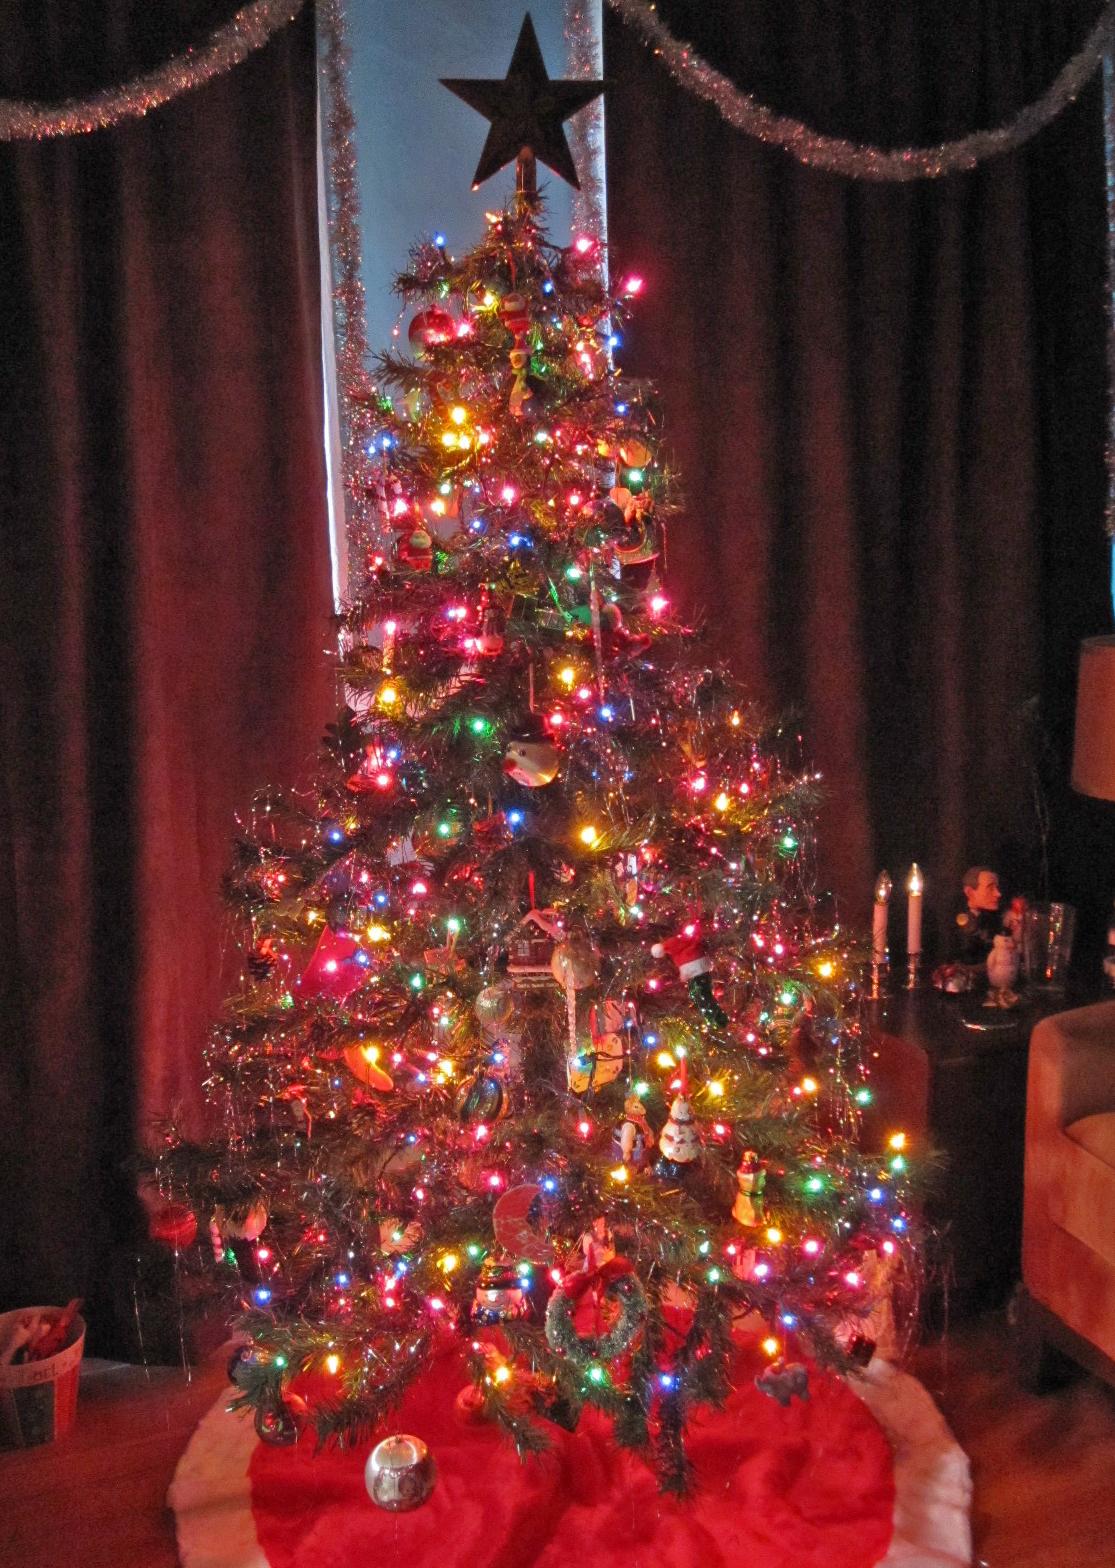 http://4.bp.blogspot.com/_2qg6TBptiOw/TQhm0_45Q8I/AAAAAAAAAvQ/60A4fMLaUCw/s1600/christmas+tree+2.jpg